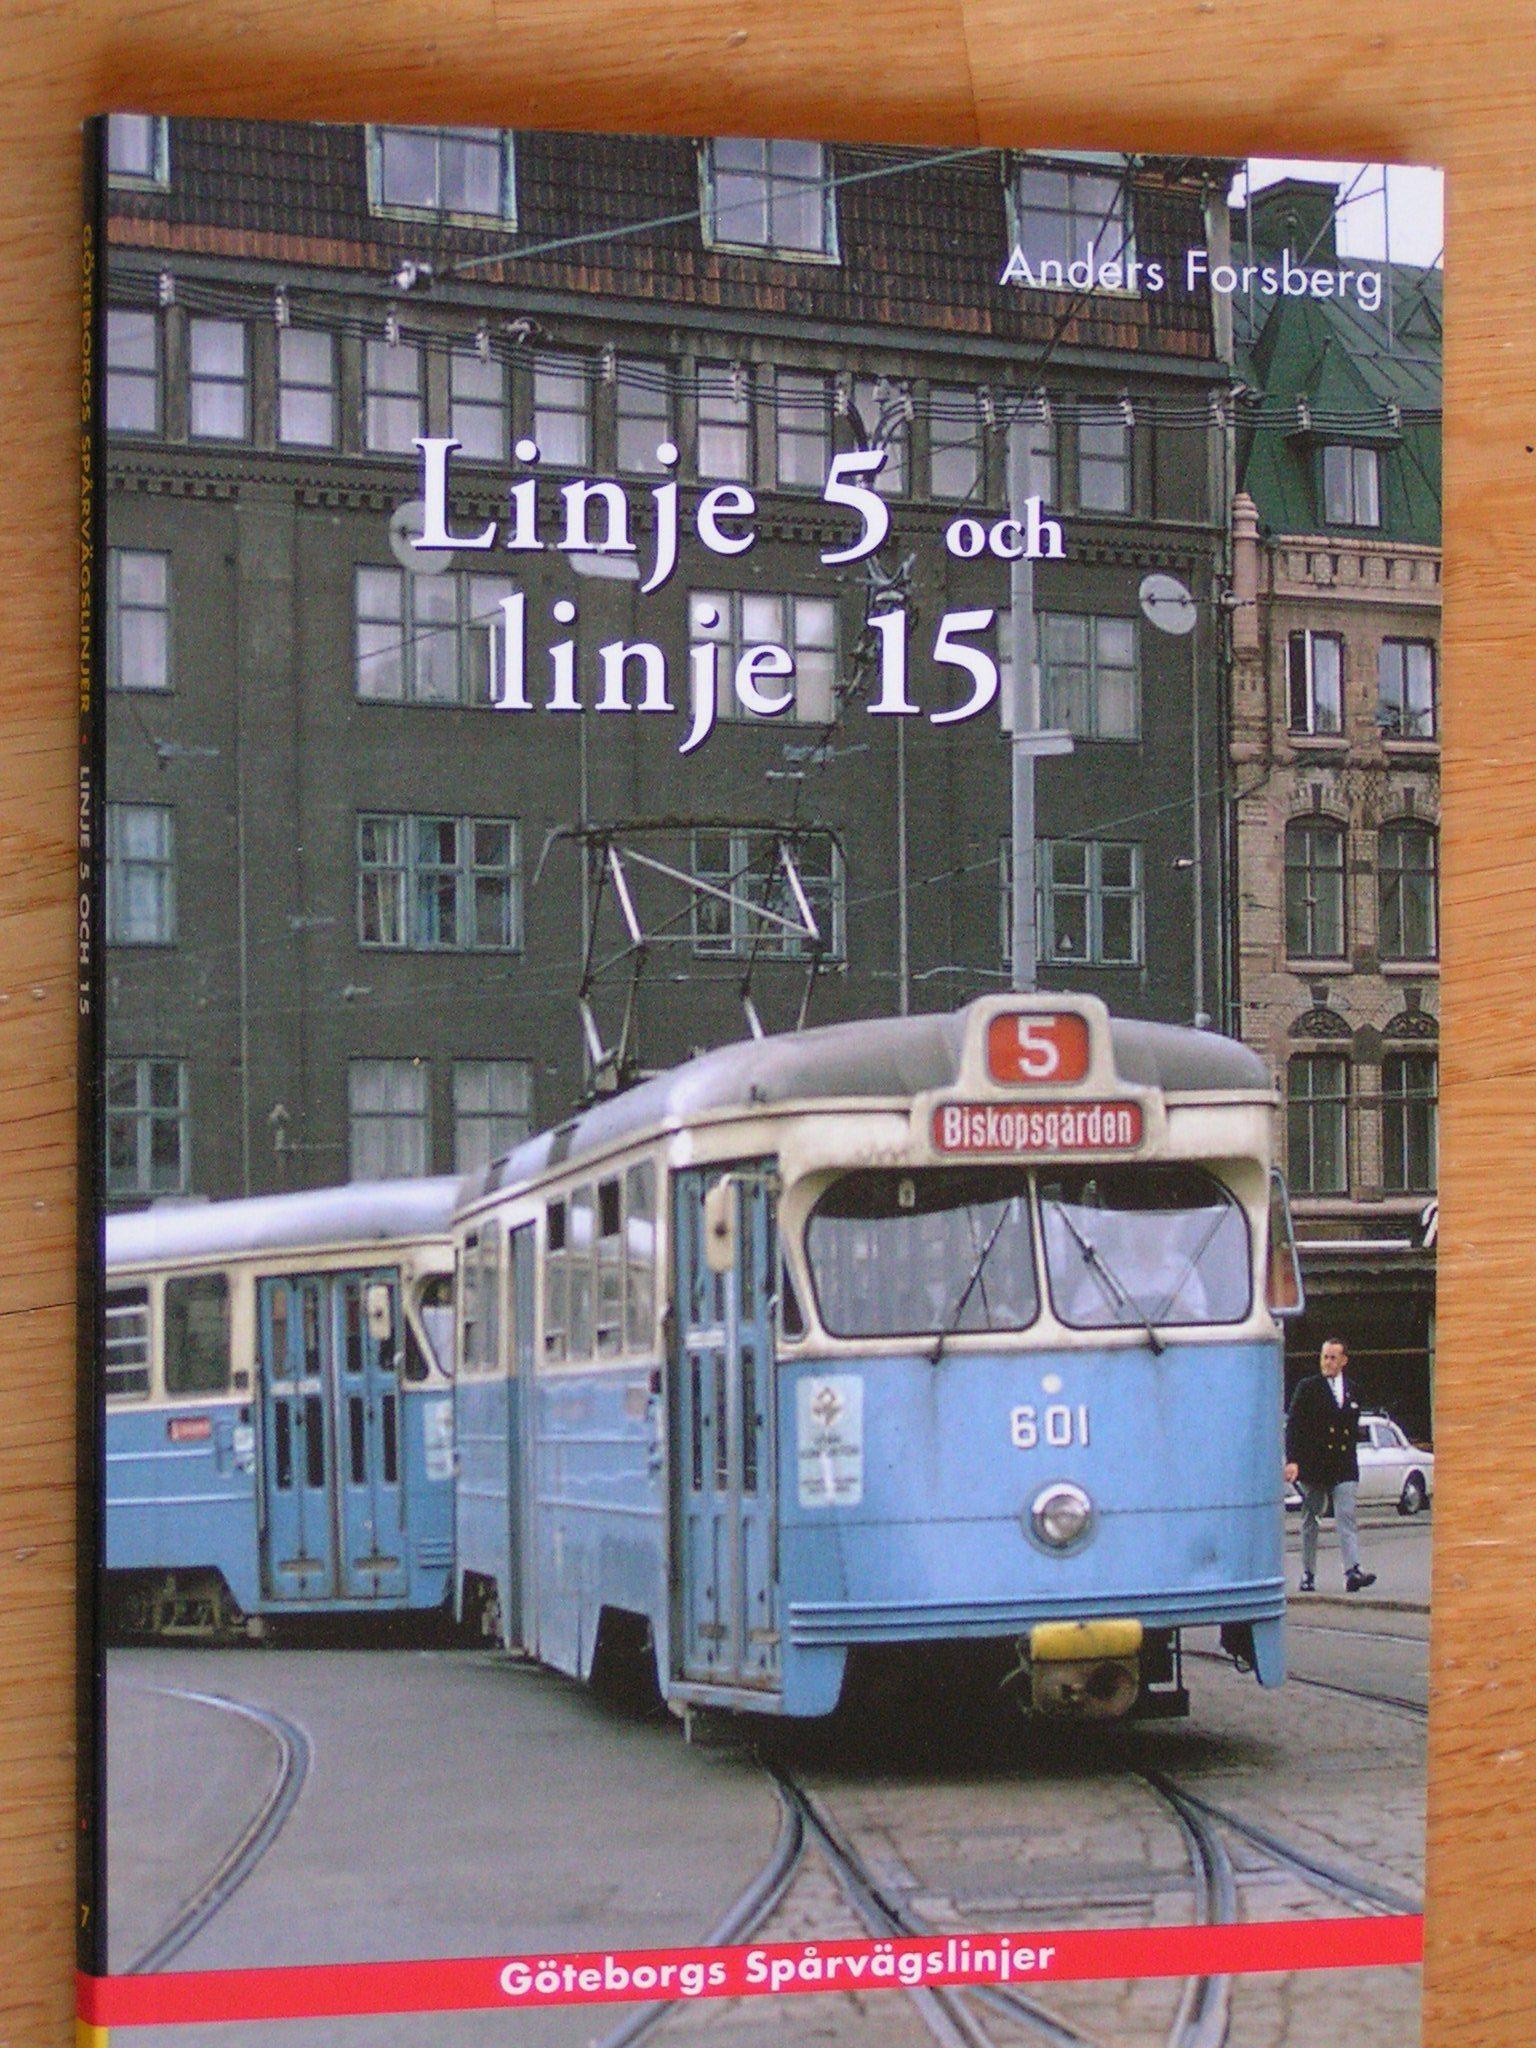 Linje 5 Och Linje 15 Goteborgs Sparvagnslinjer 341758309